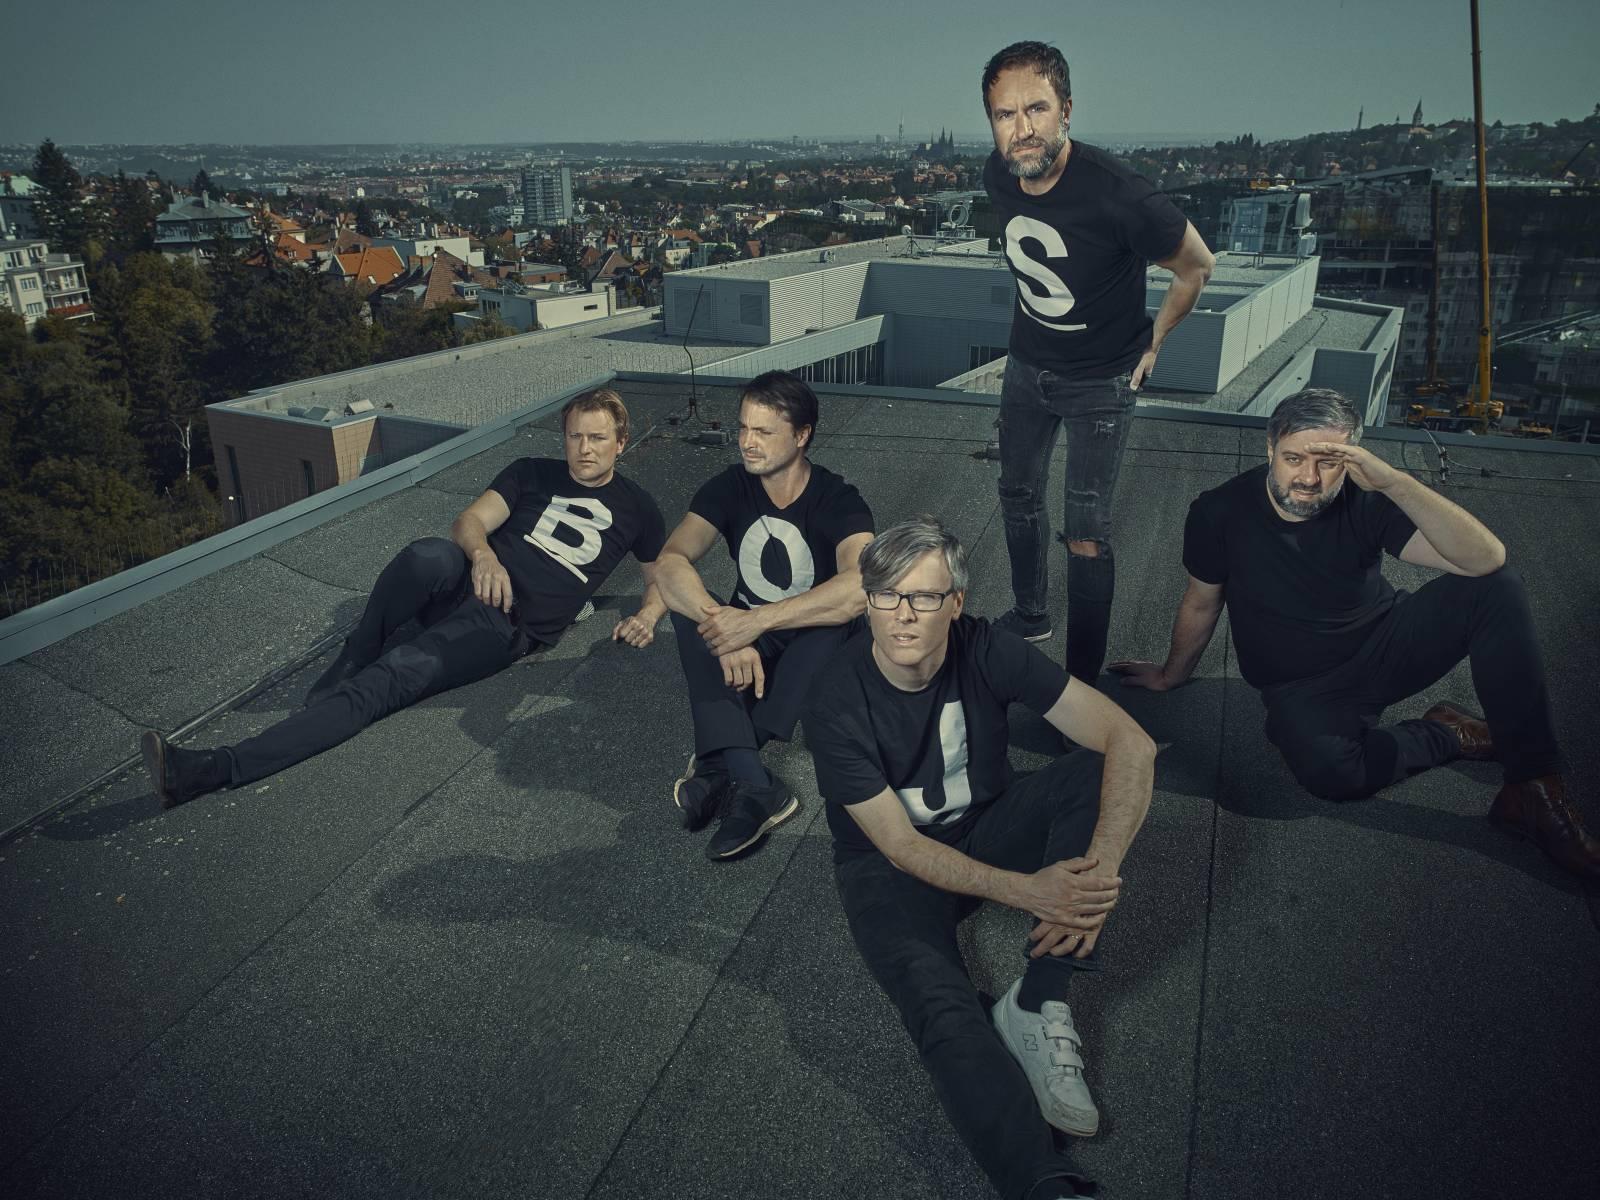 ROZHOVOR | Tata Bojs: Zvony už celkem solidně bimbaj